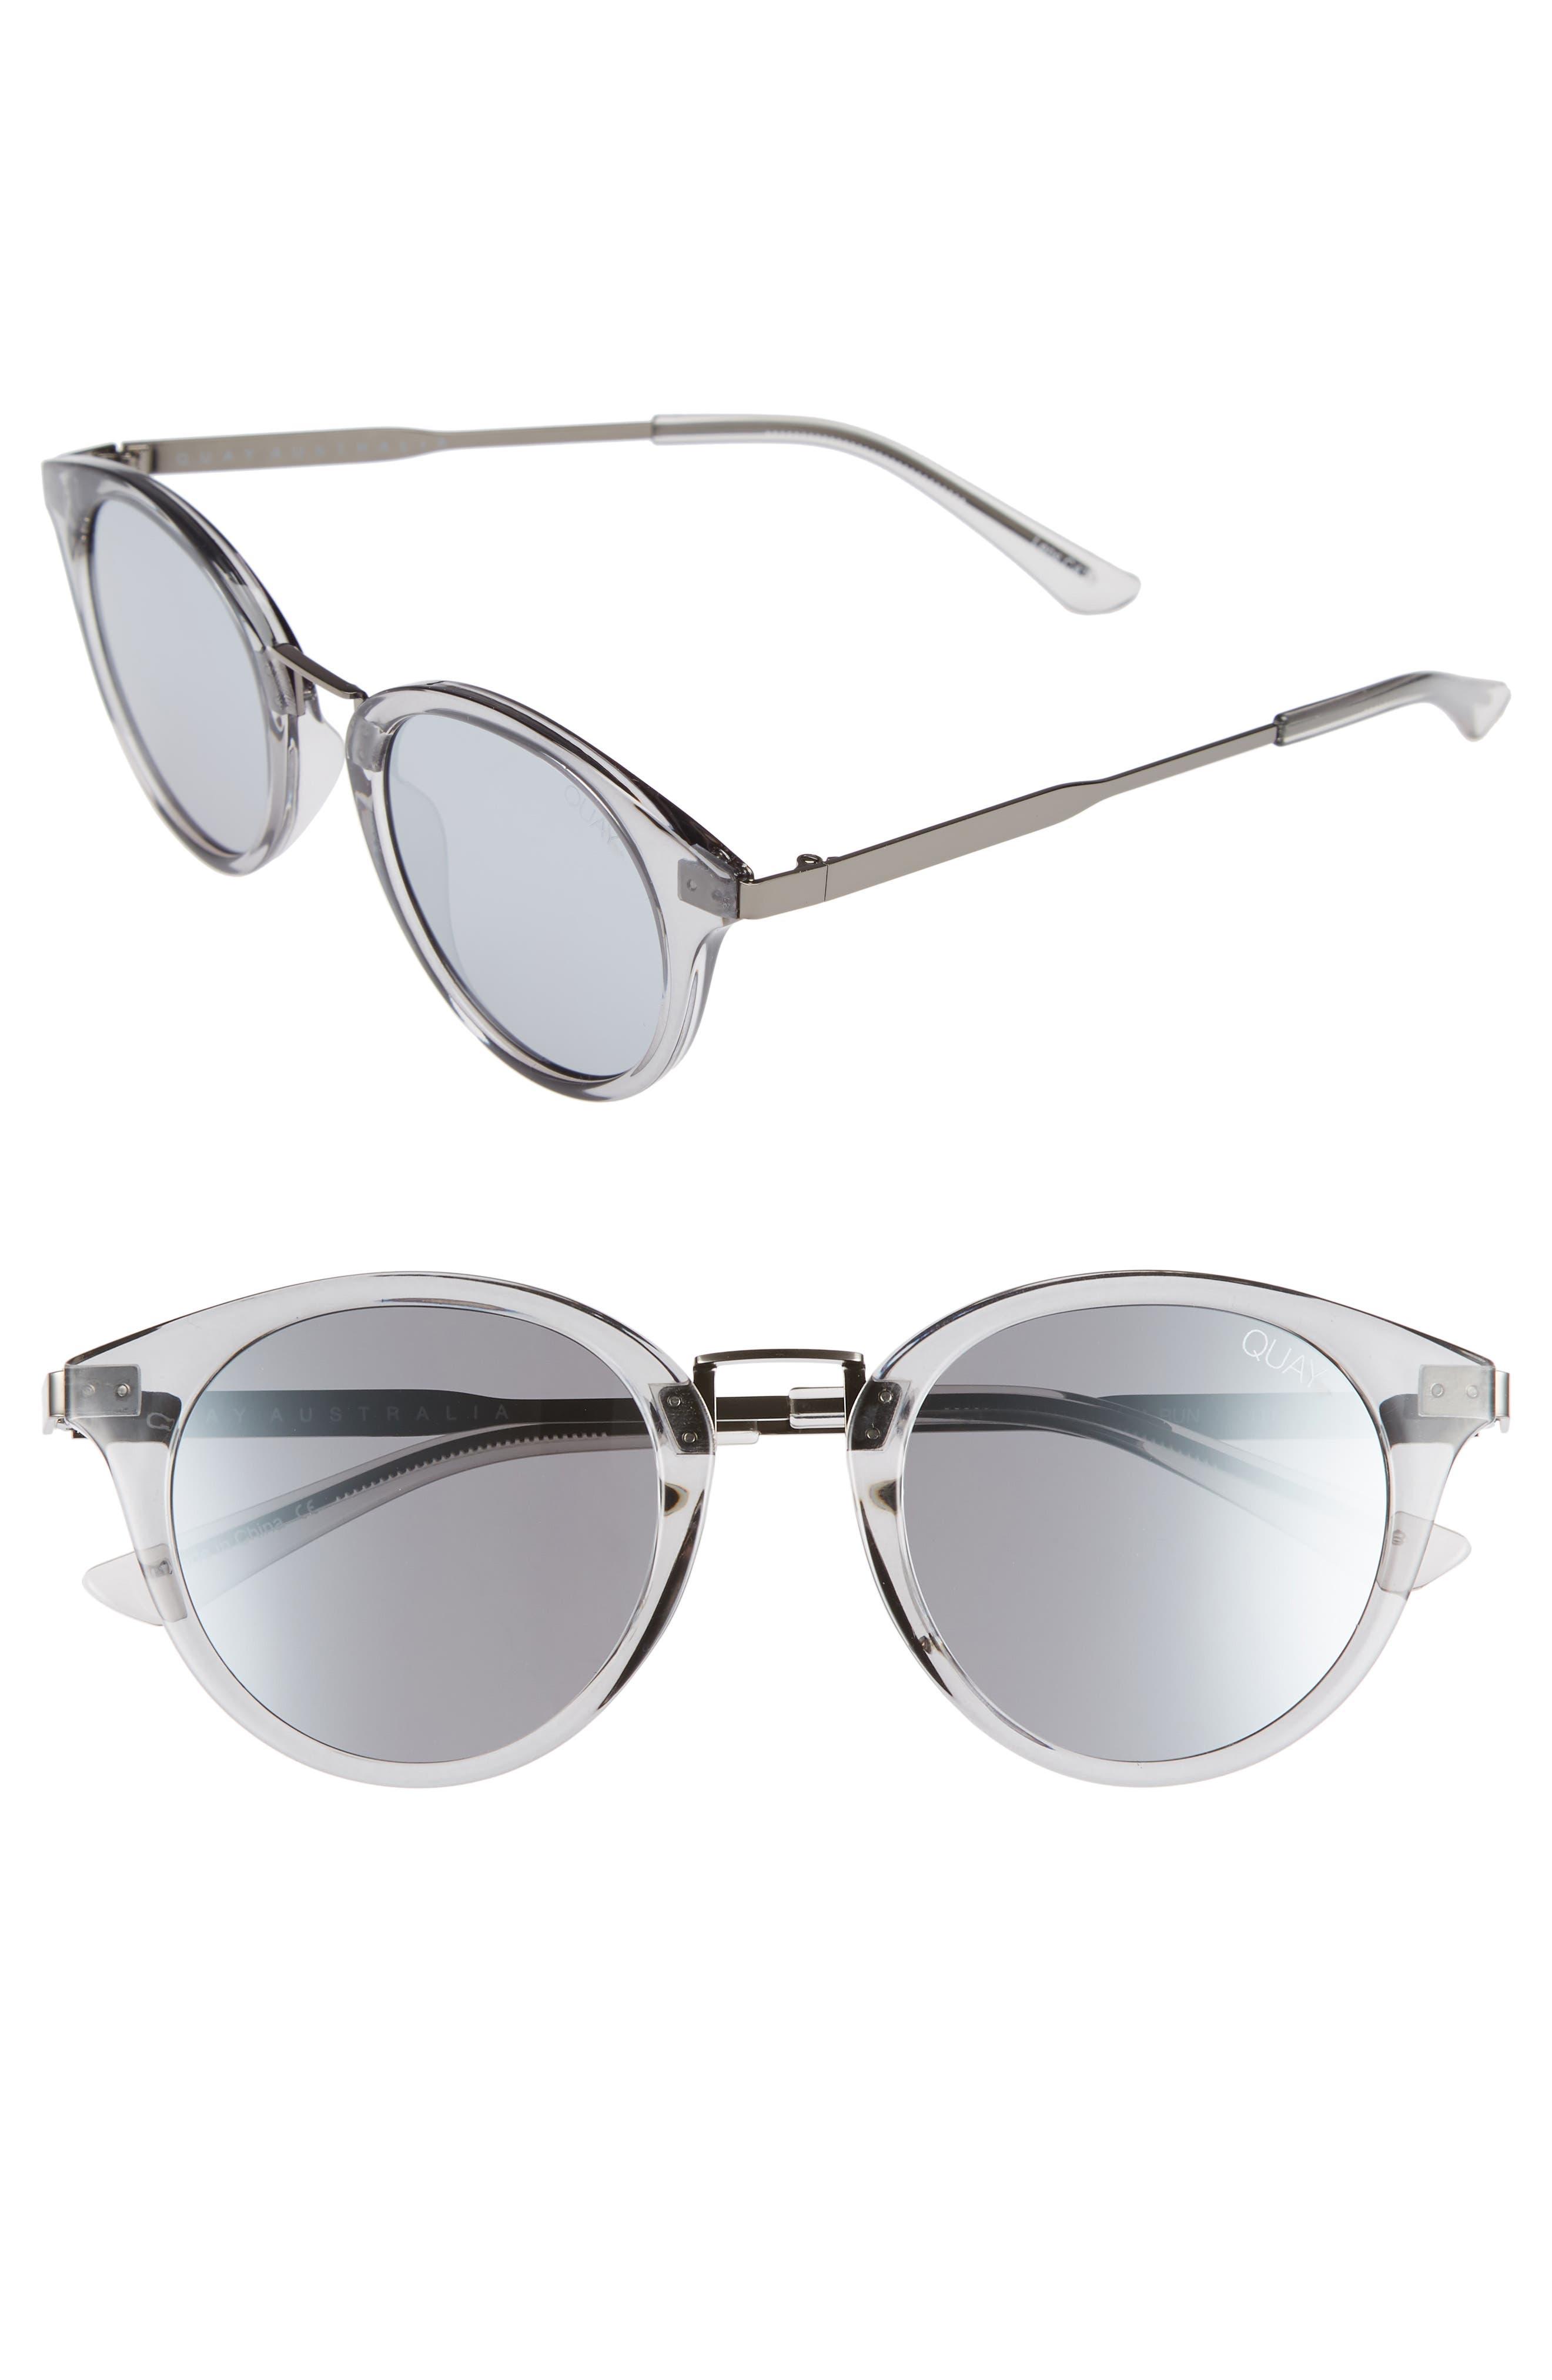 Quay Australia Gotta Run 4m Sunglasses - Grey/ Silver